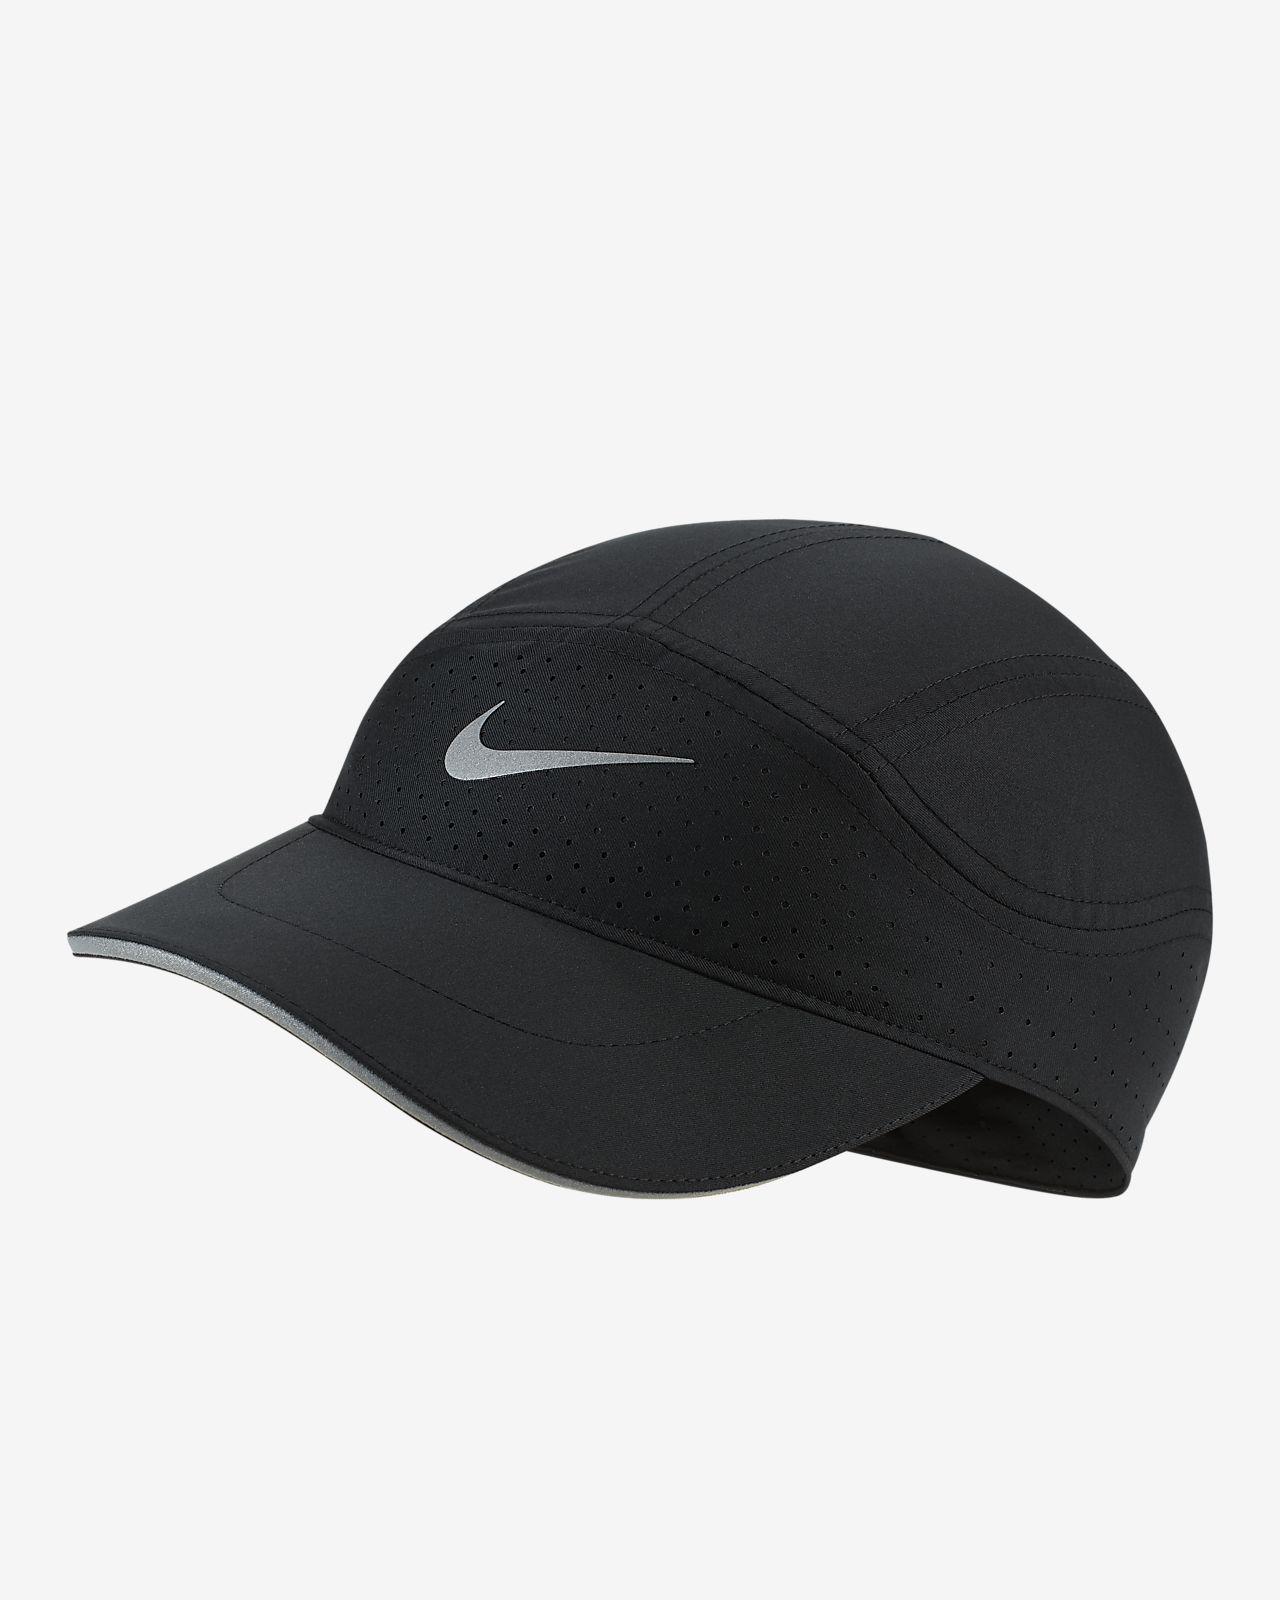 Nike AeroBill Tailwind Hardlooppet